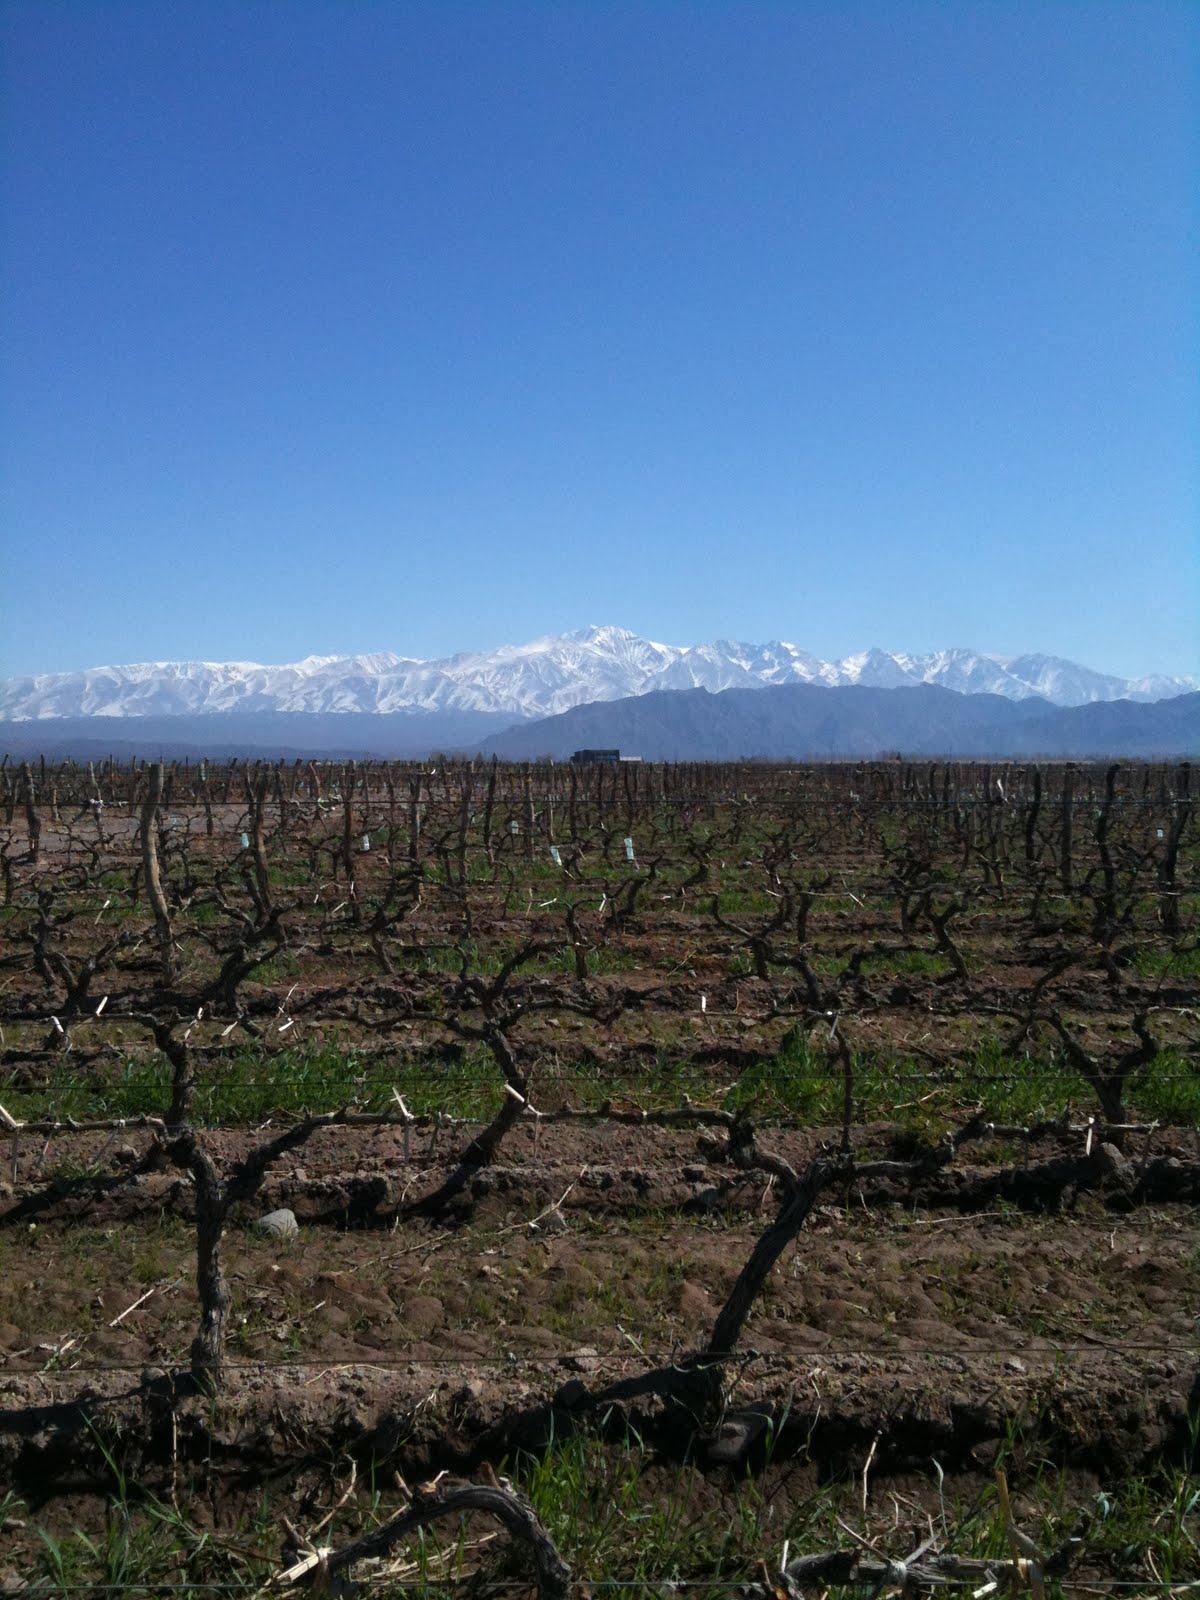 Wine Travel Stories: The Unique Vineyards of Mendoza, Argentina